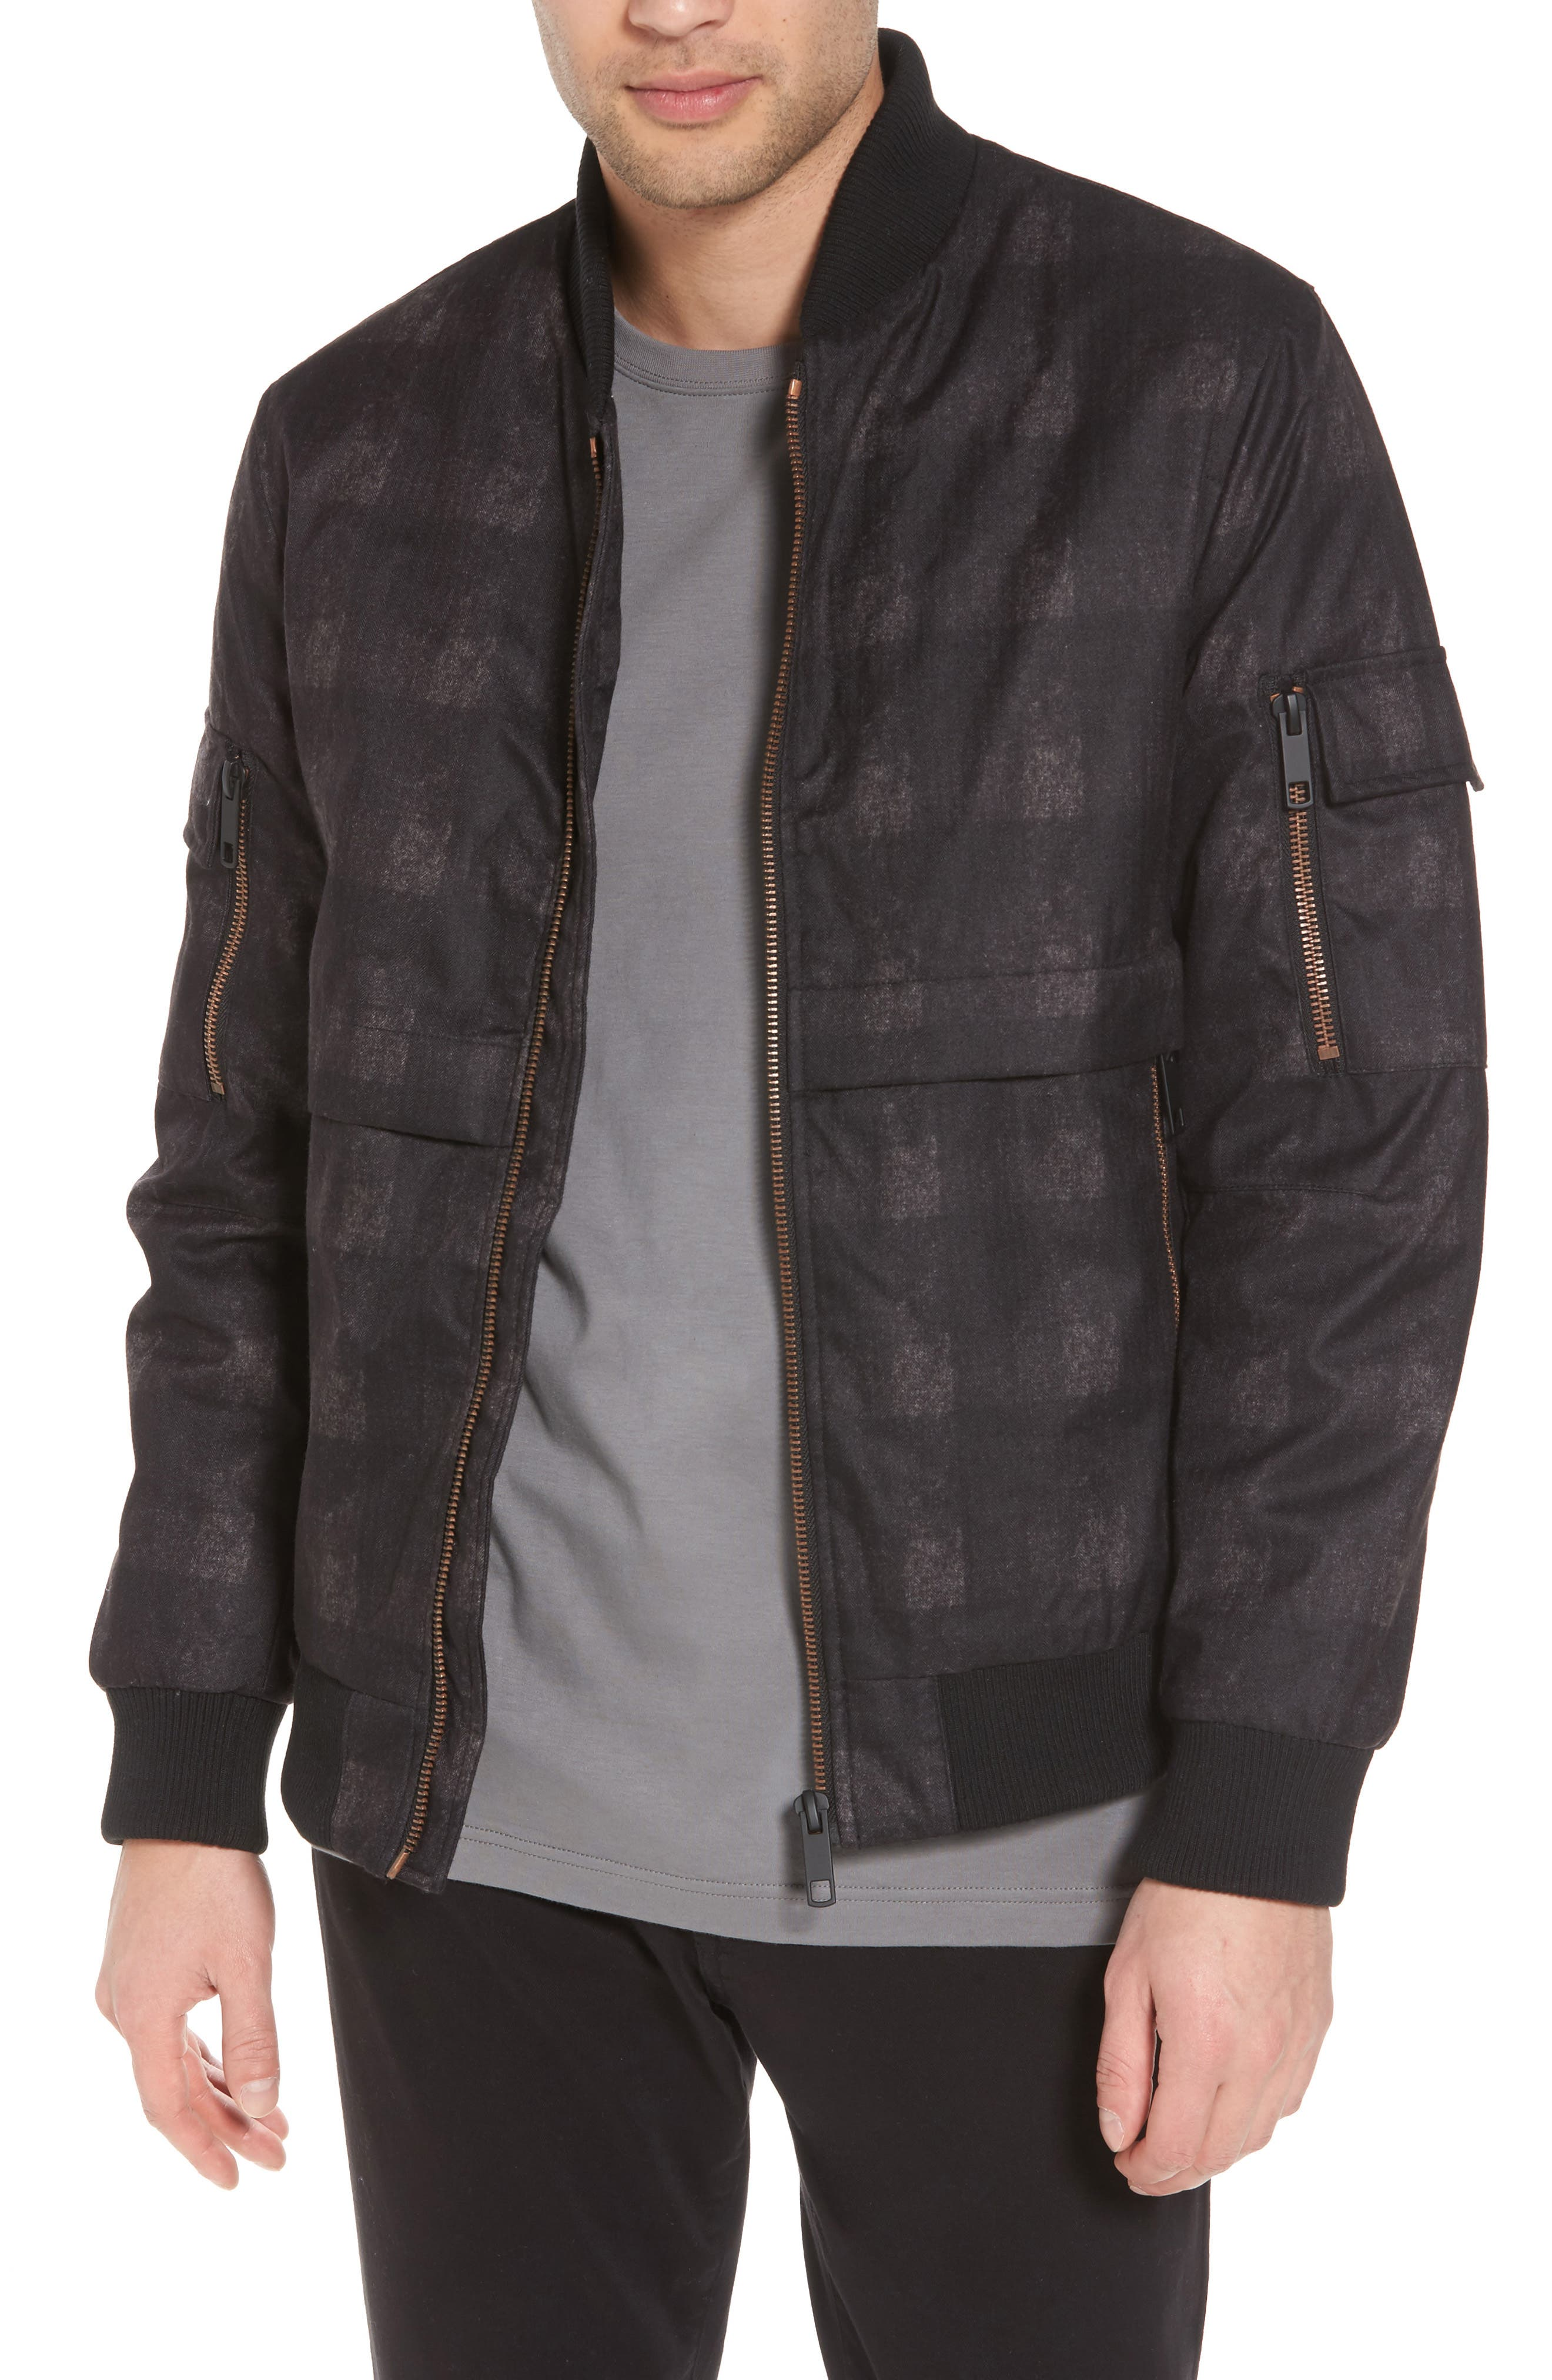 Alternate Image 1 Selected - Antony Morato Bomber Jacket